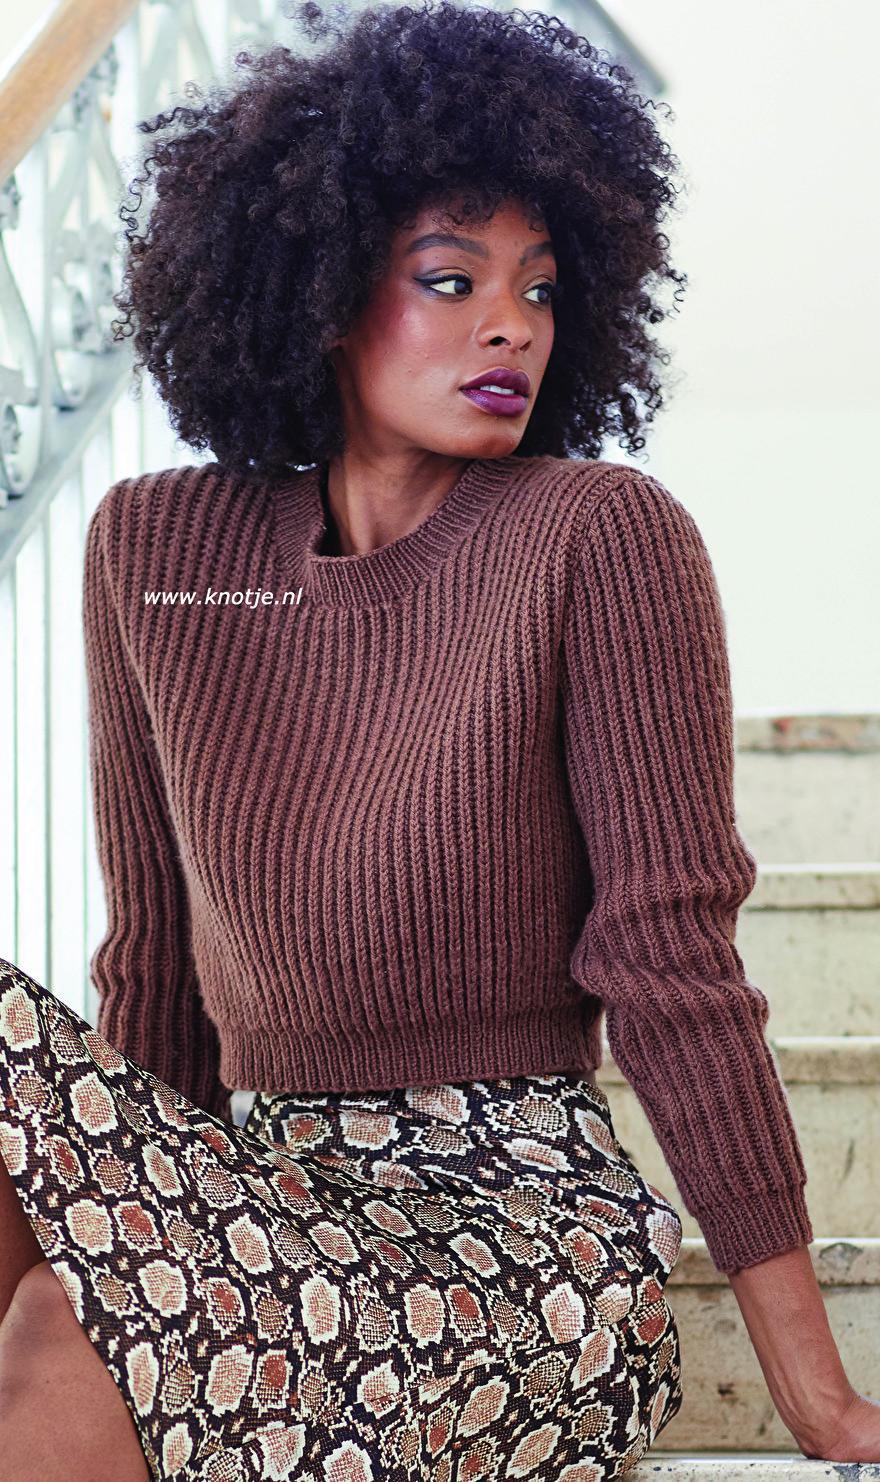 016 cropped sweater7kopie.jpg